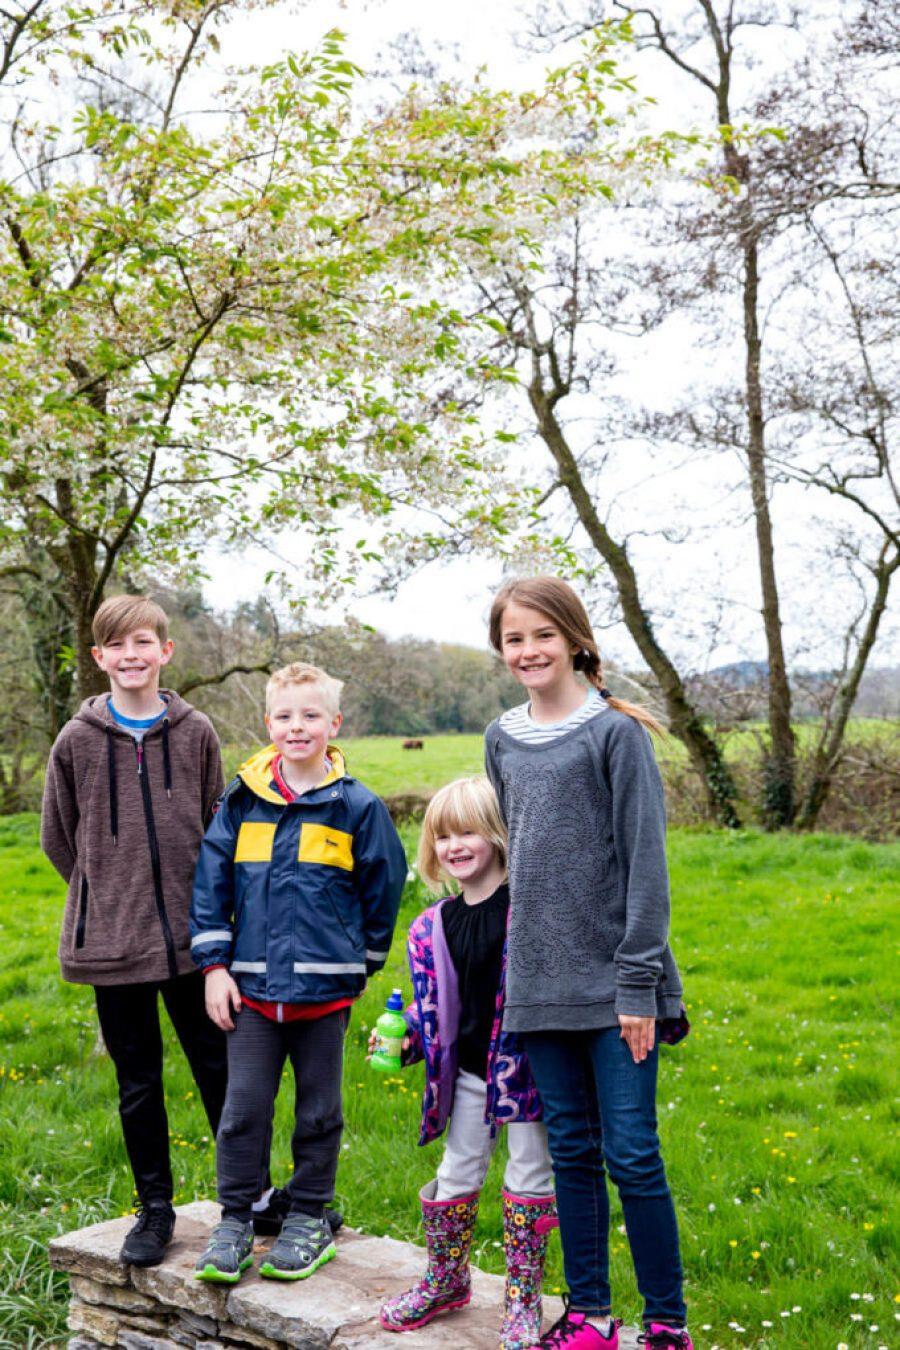 Blarney Castle Grounds in Ireland